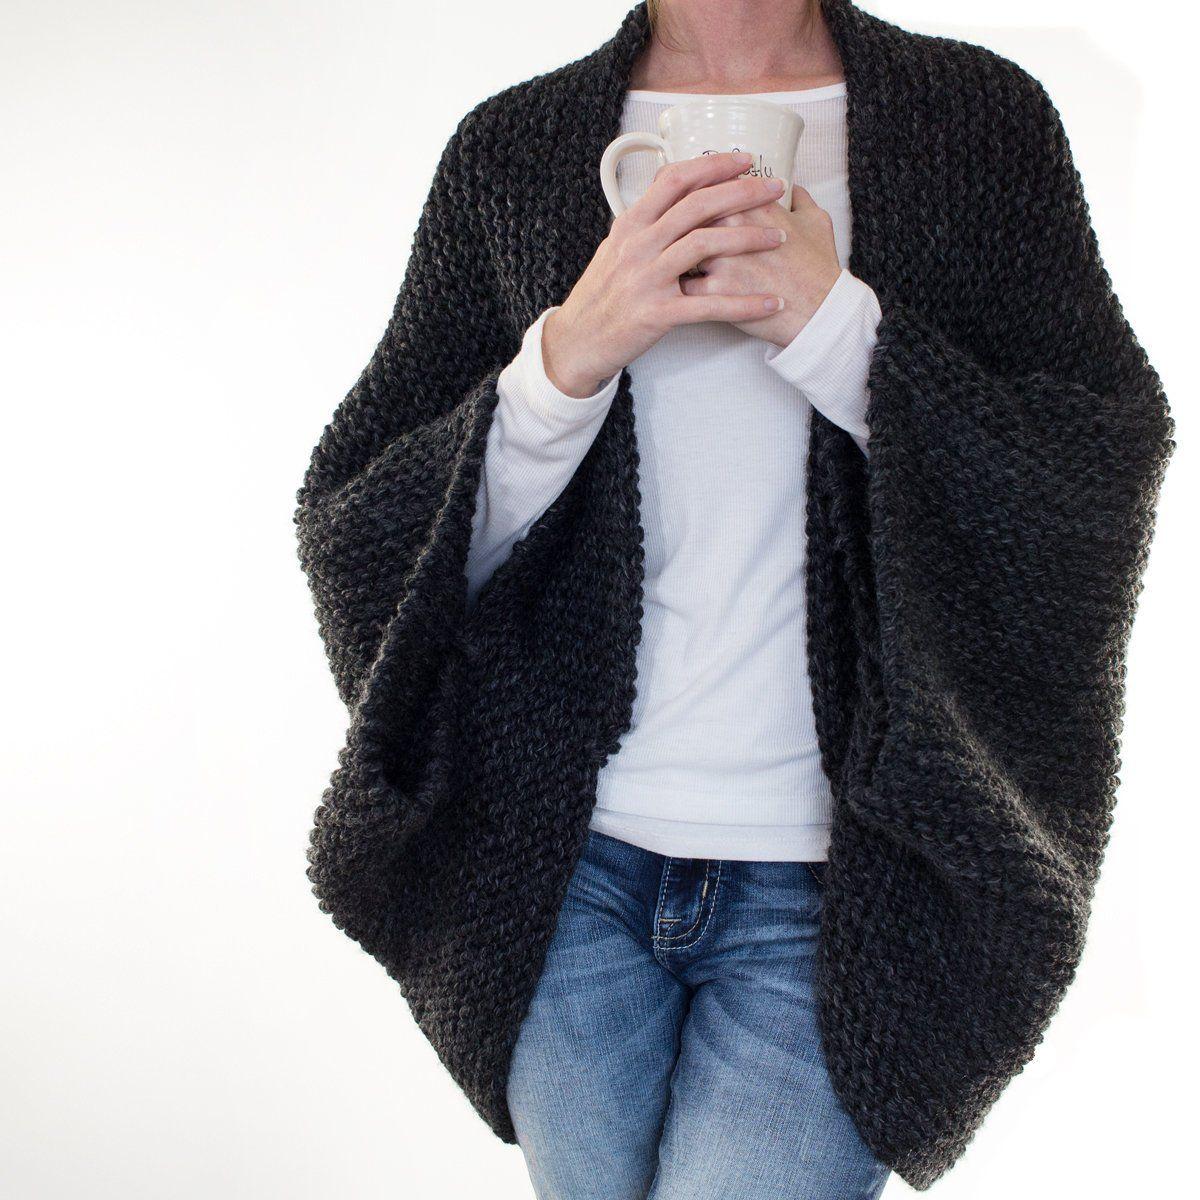 f8ee8904539983 Knitting Pattern Oversized Scoop Sweater Knit Cocoon